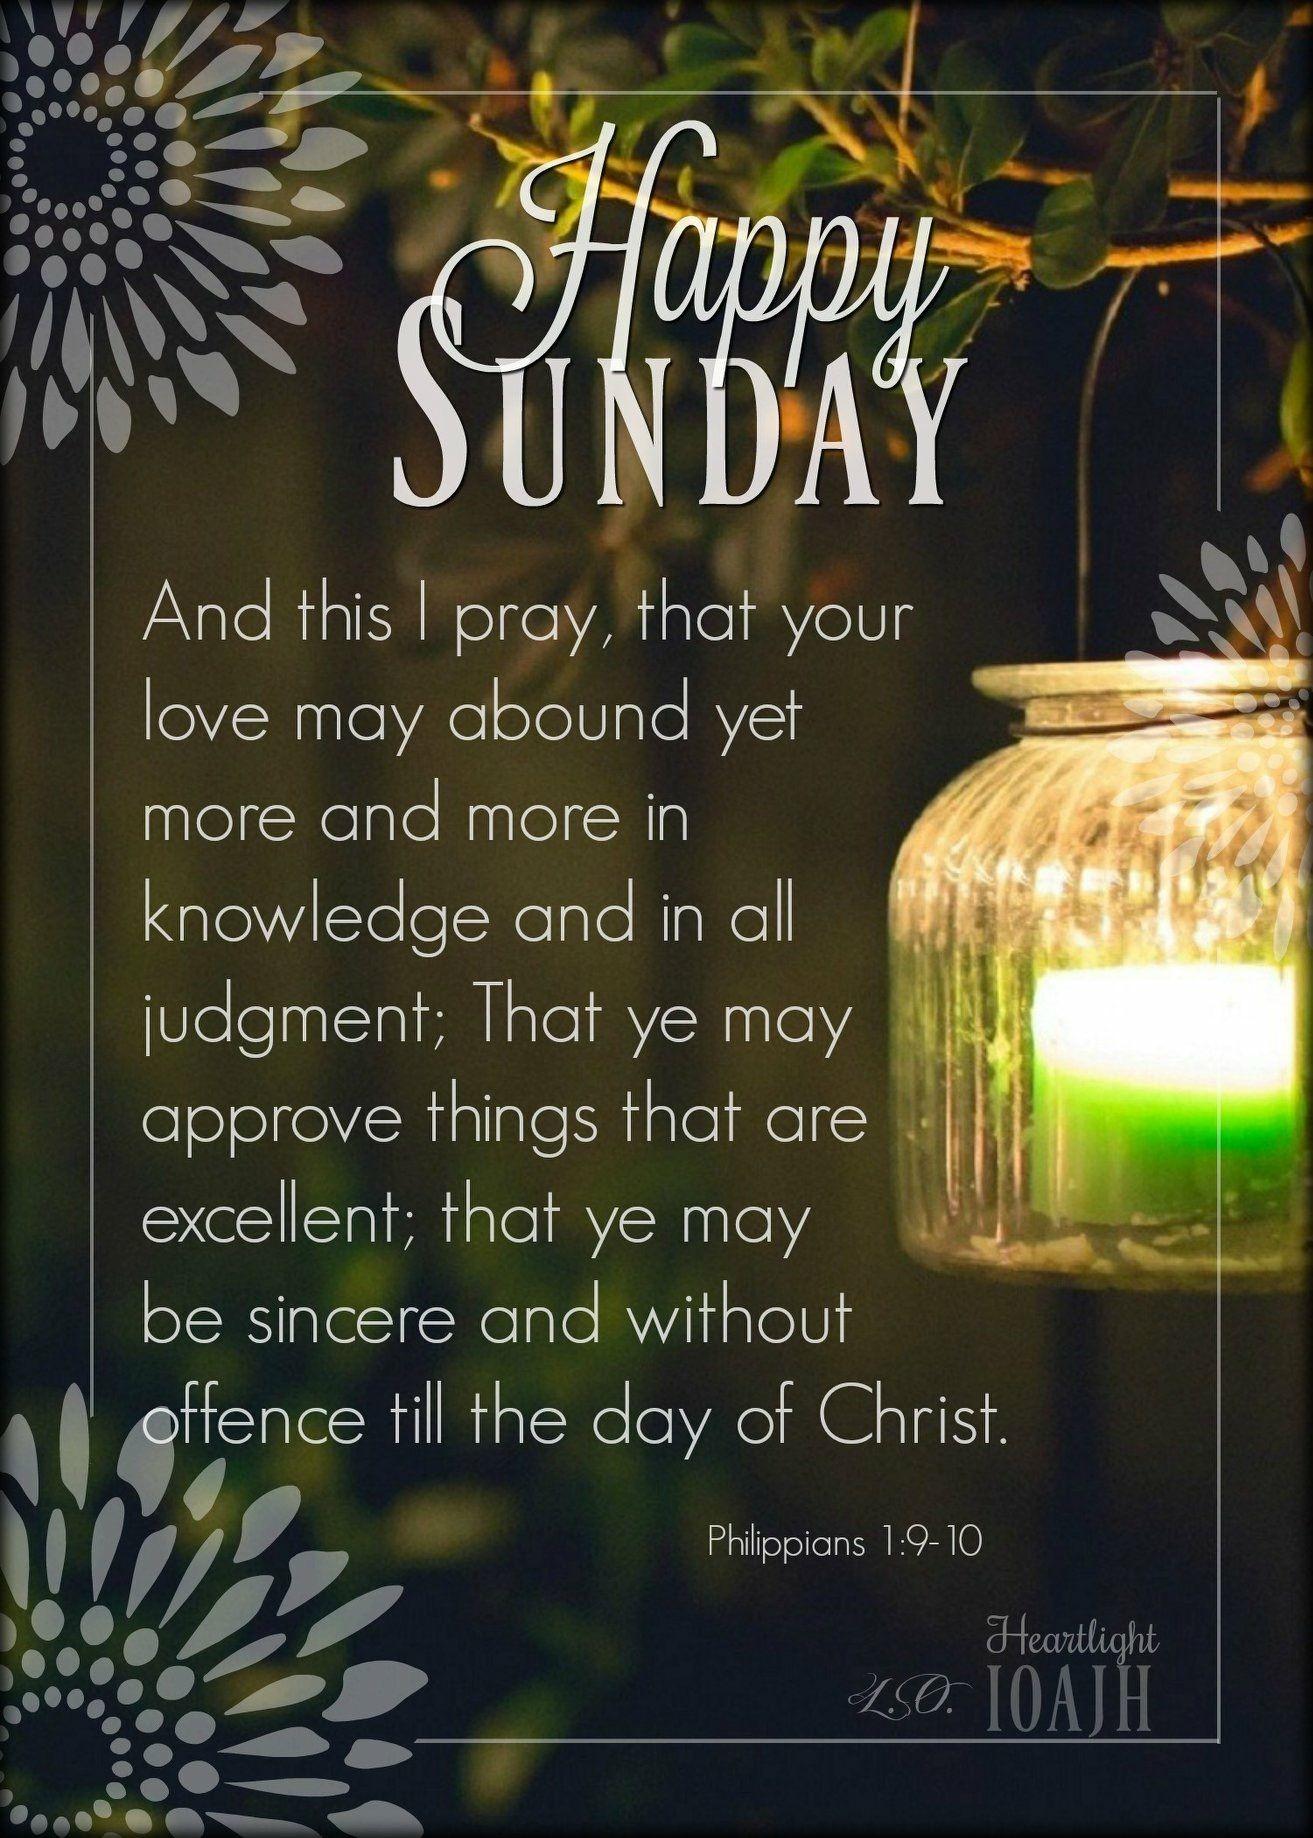 20 Sunday ideas   happy sunday quotes, sunday greetings, blessed ...